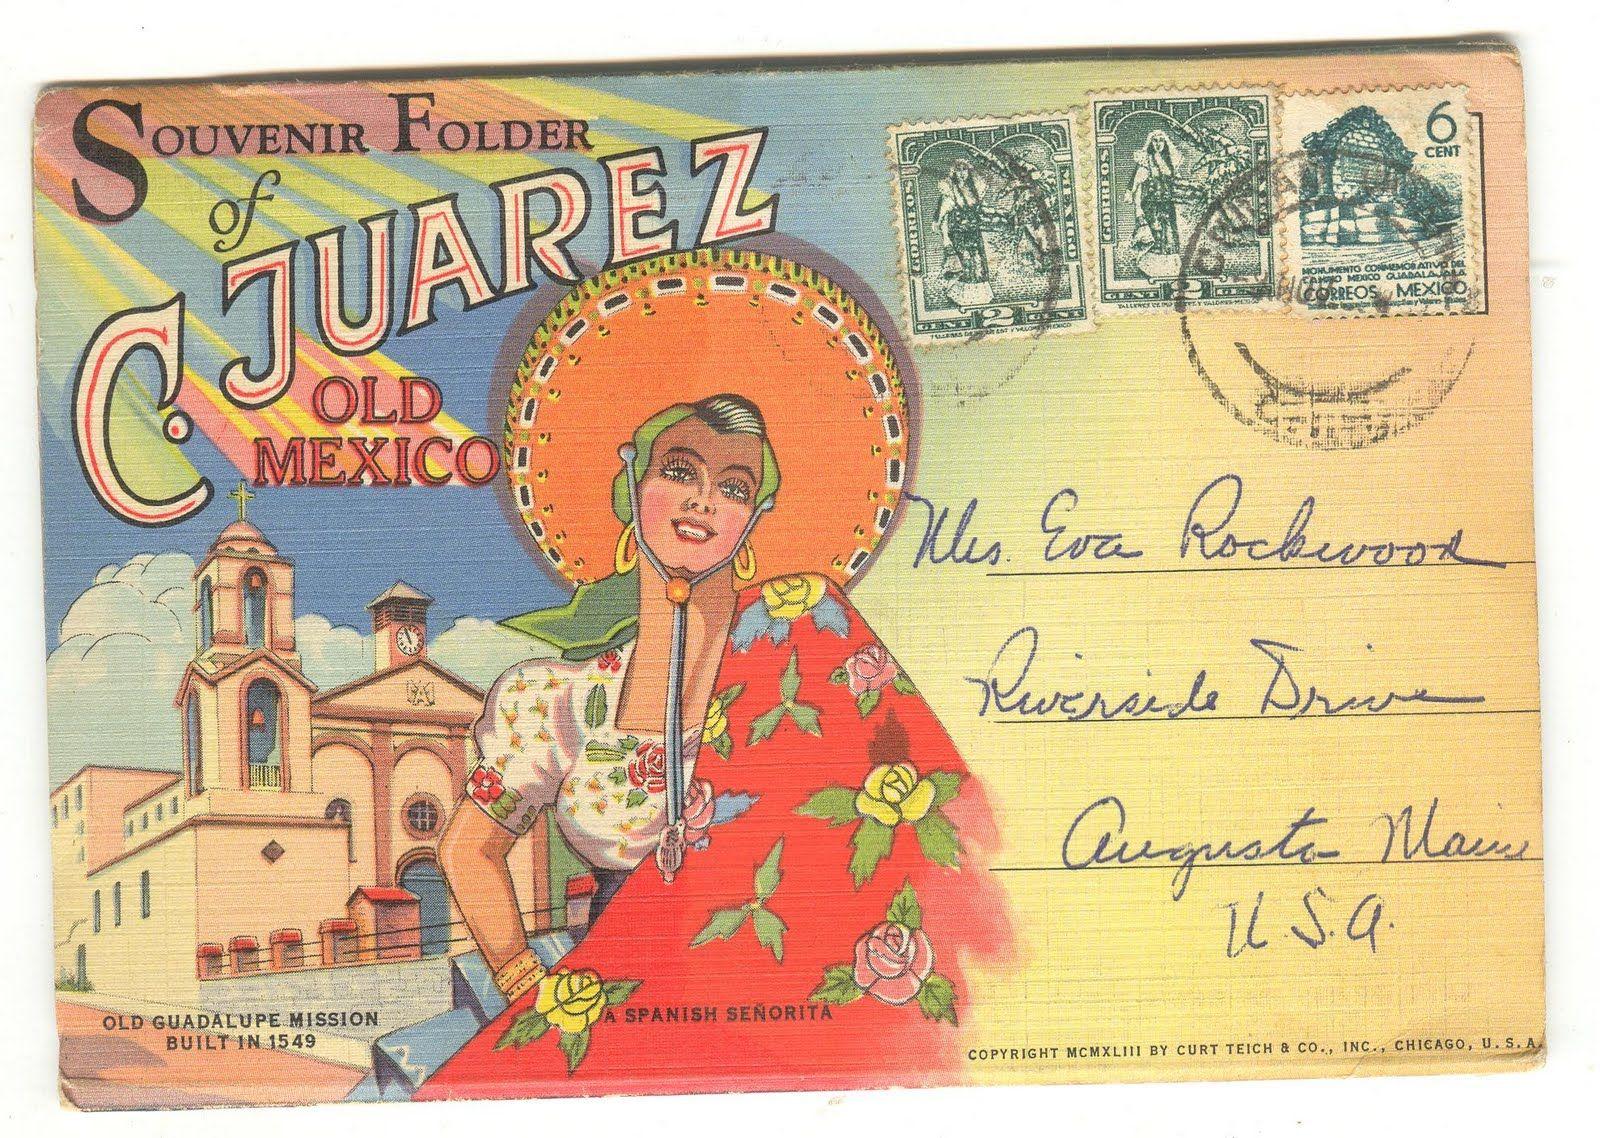 Vintage Postcard Muted Orange Blue Green Yellow Vintage Postcards Vintage Postcard Postcard